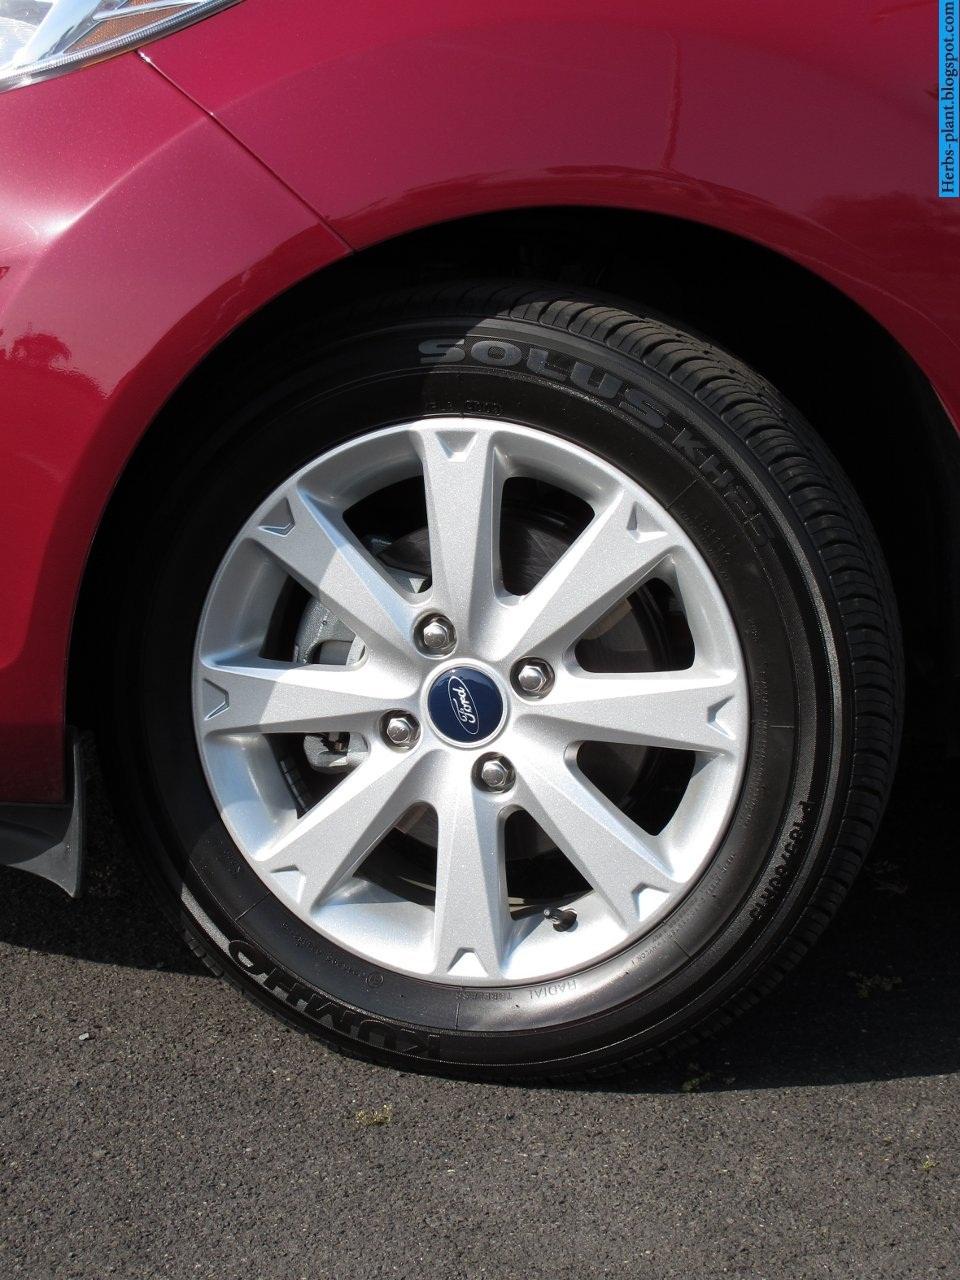 Ford fiesta car 2013 tyres/wheels - صور اطارات سيارة فورد فيستا 2013